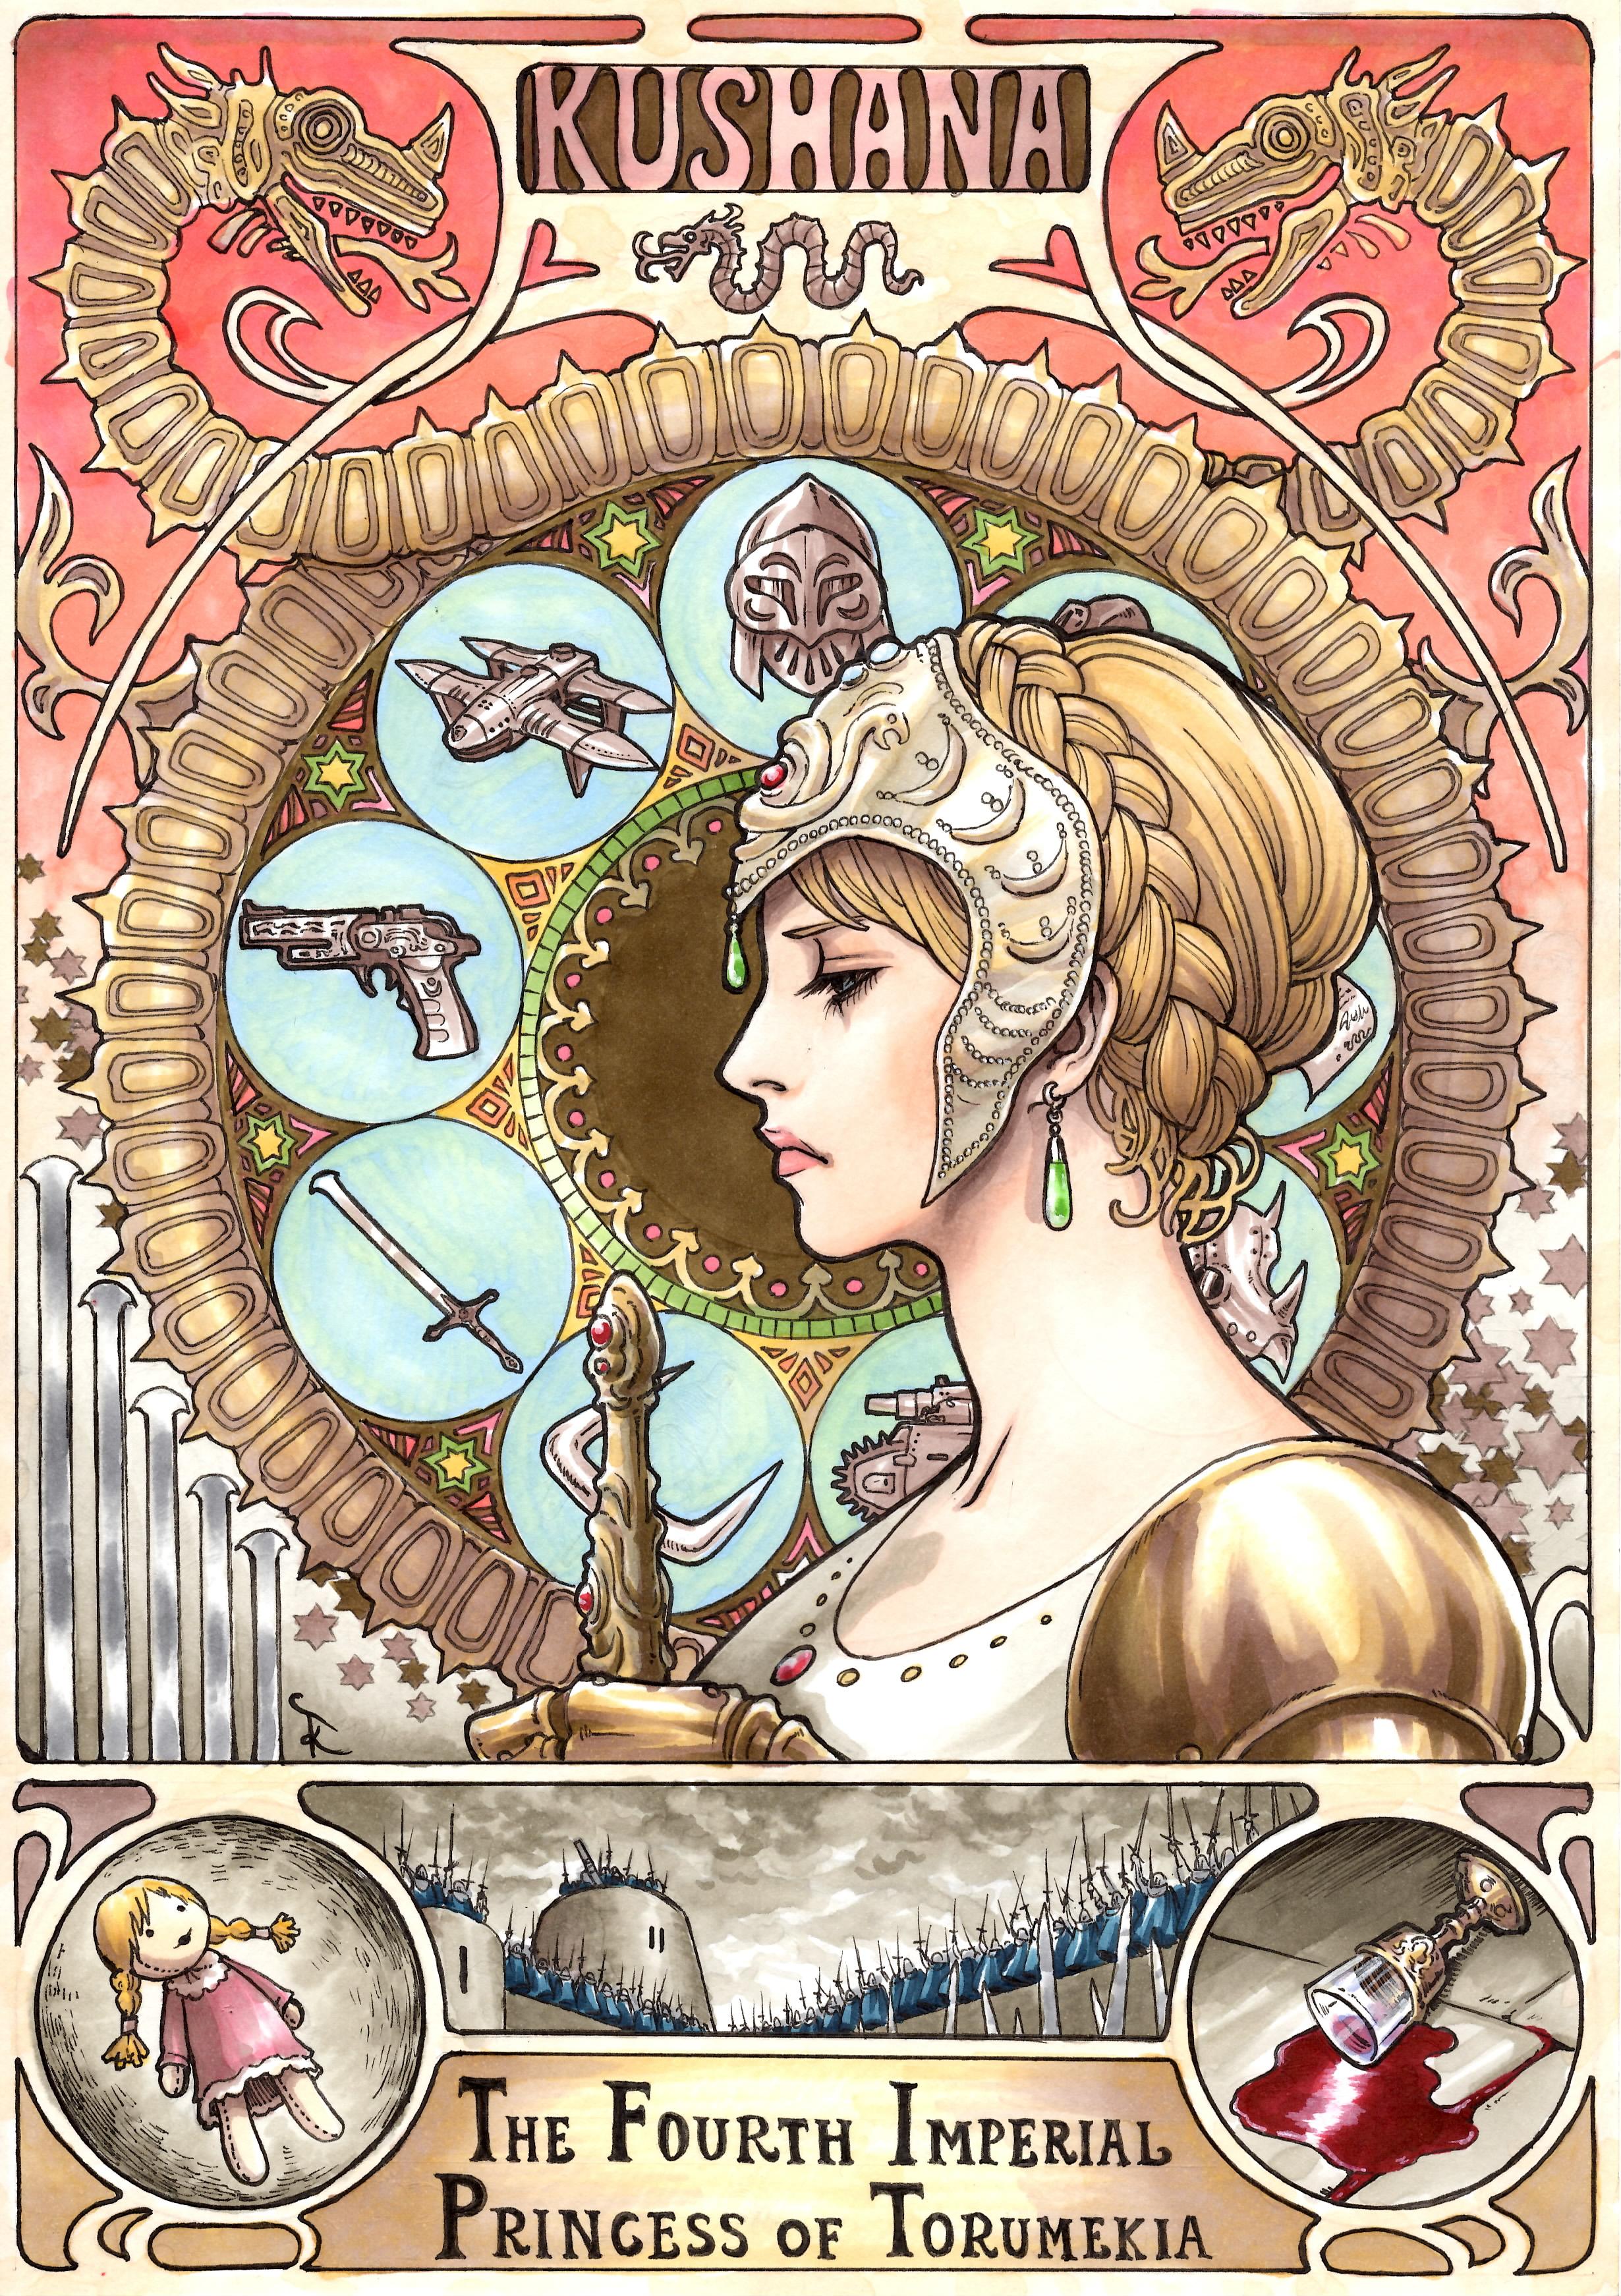 Art-Nouveau-Ghibli-Nausicaa-1